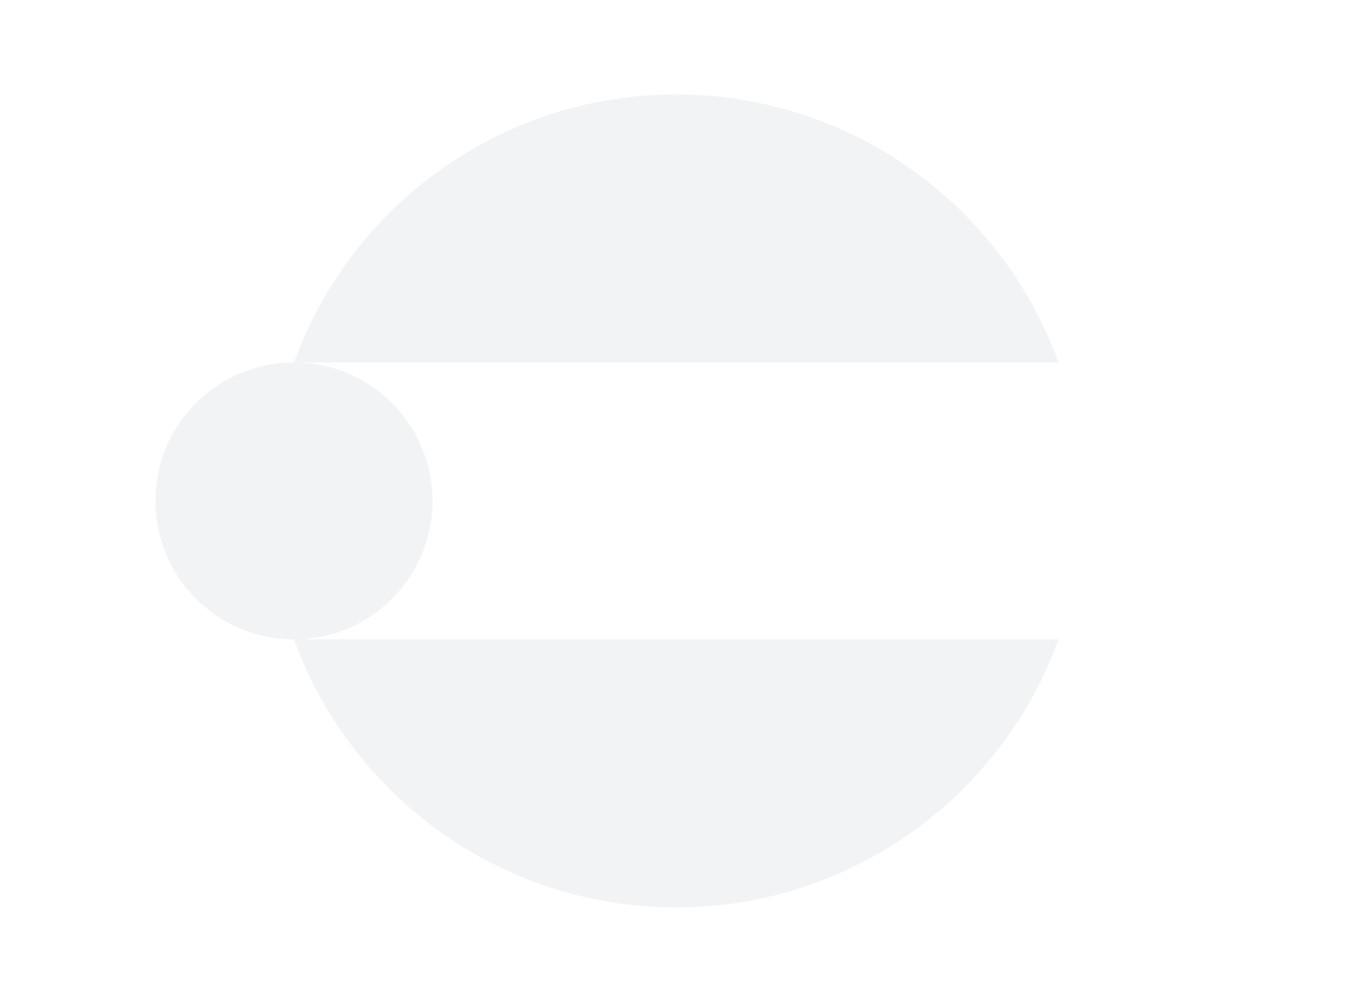 XAOC Devices Logo Shirt (Black) - L